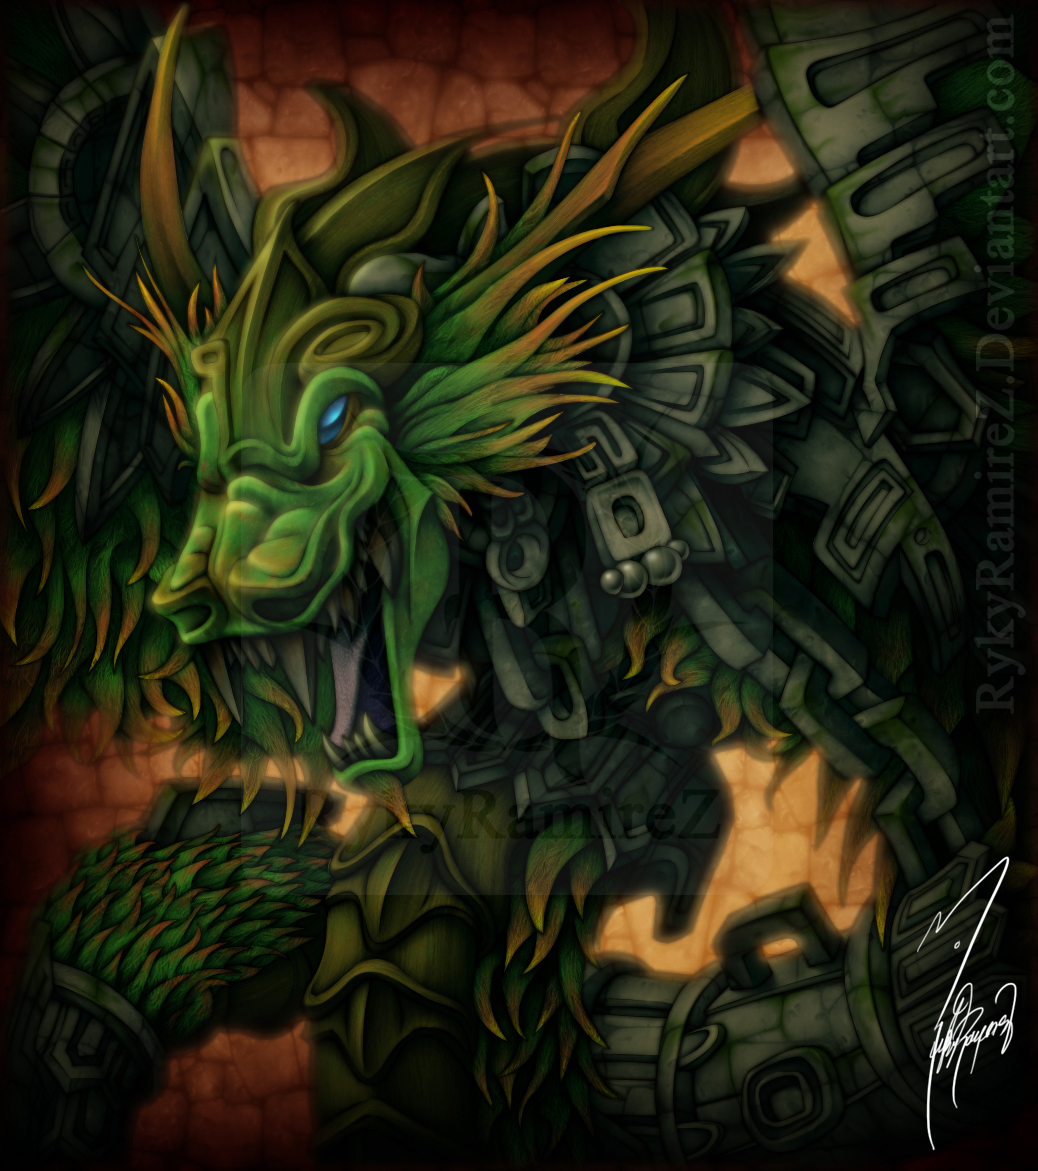 My Gran Quetzalcoatl 2010 D By Rykyramirez On Deviantart